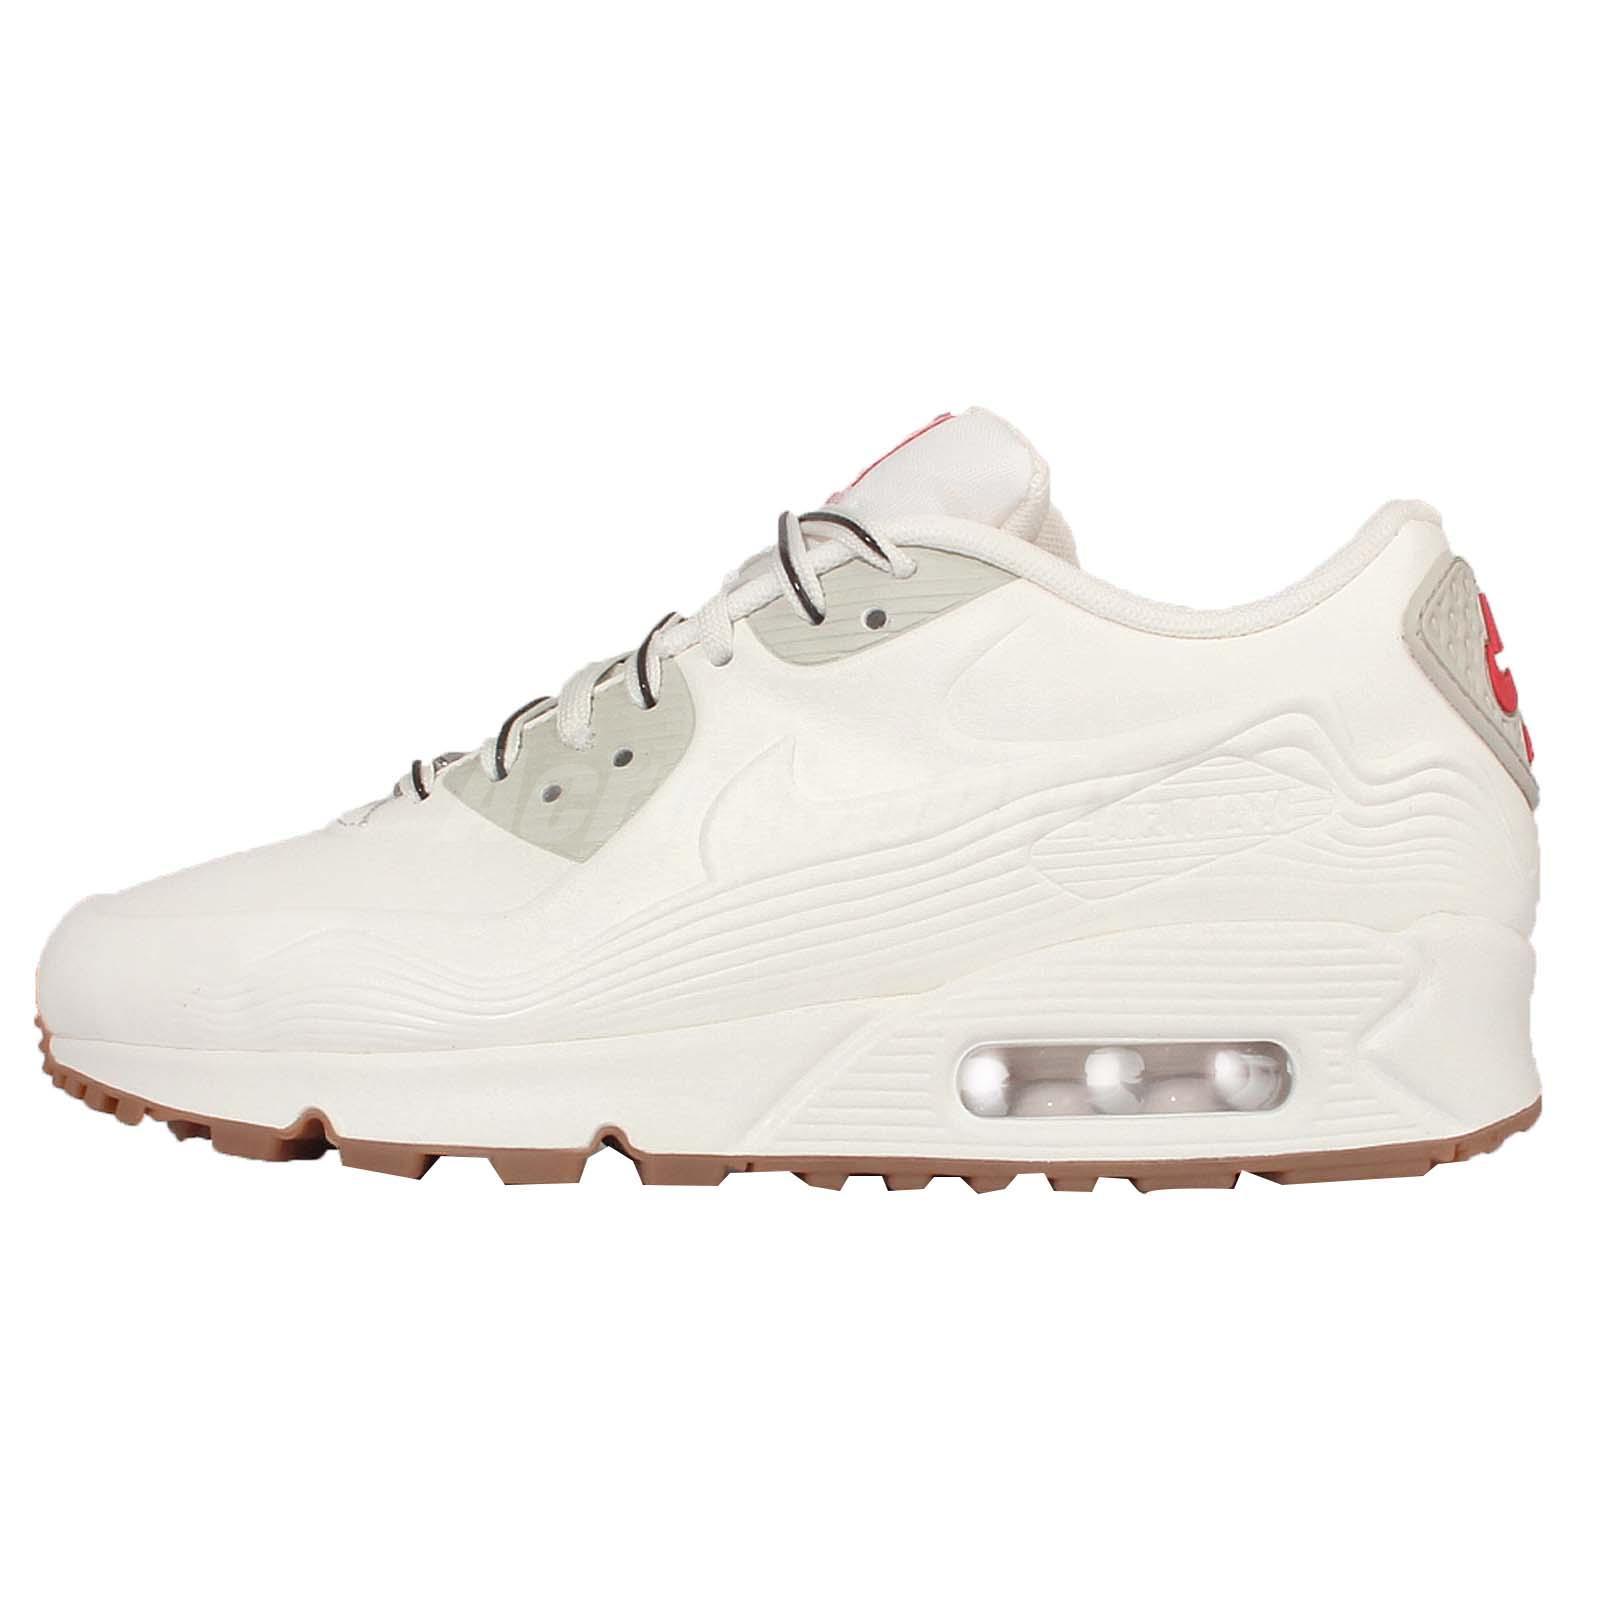 half off fa0f4 553e7 34318 70d47  italy wmns nike air max 90 vt qs tokyo harajuku crepe womens  running shoes 813153 100